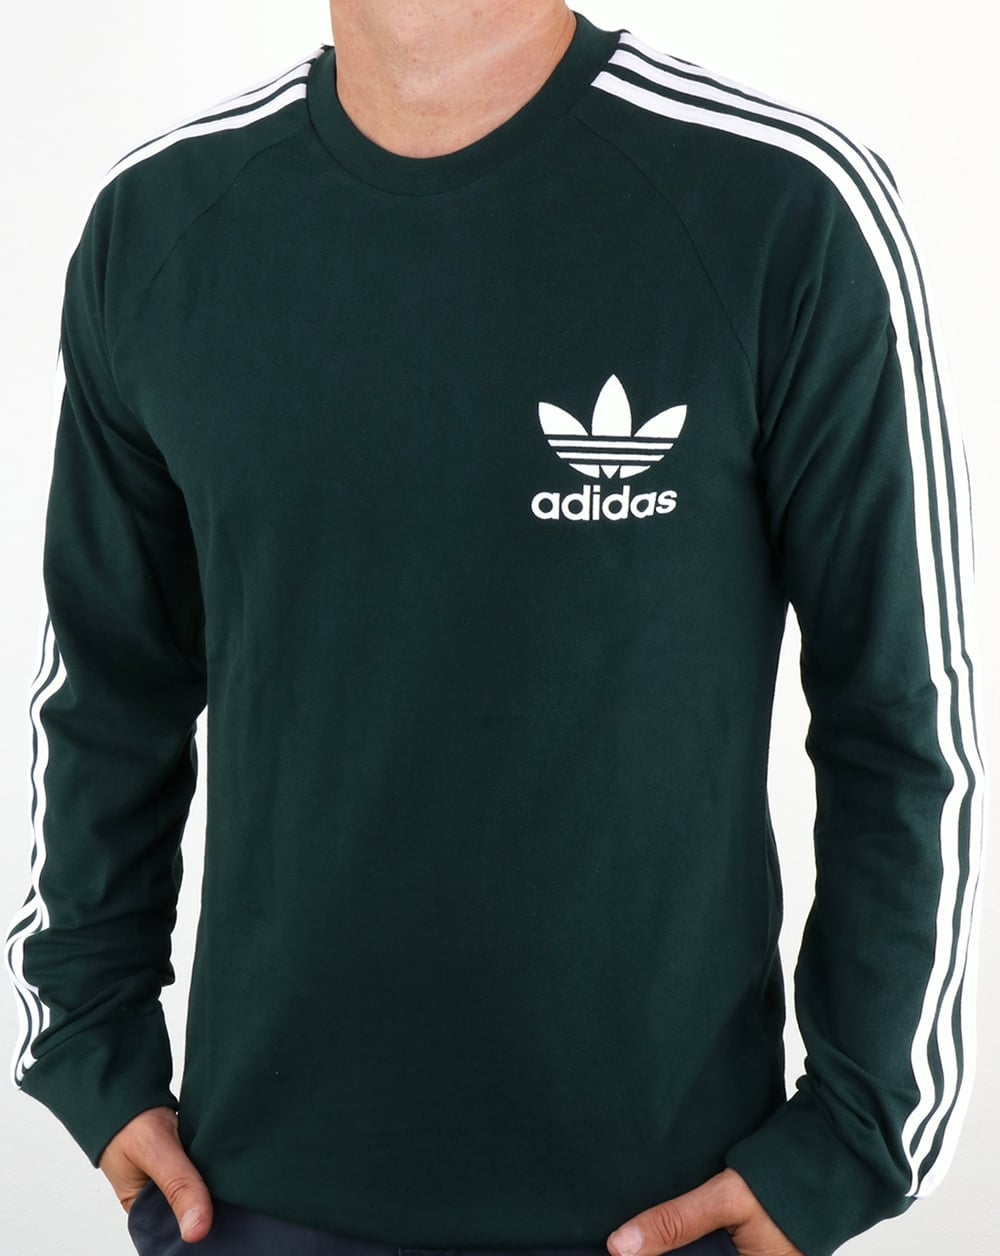 Adidas Originals Long Sleeve Pique T Shirt Green Night